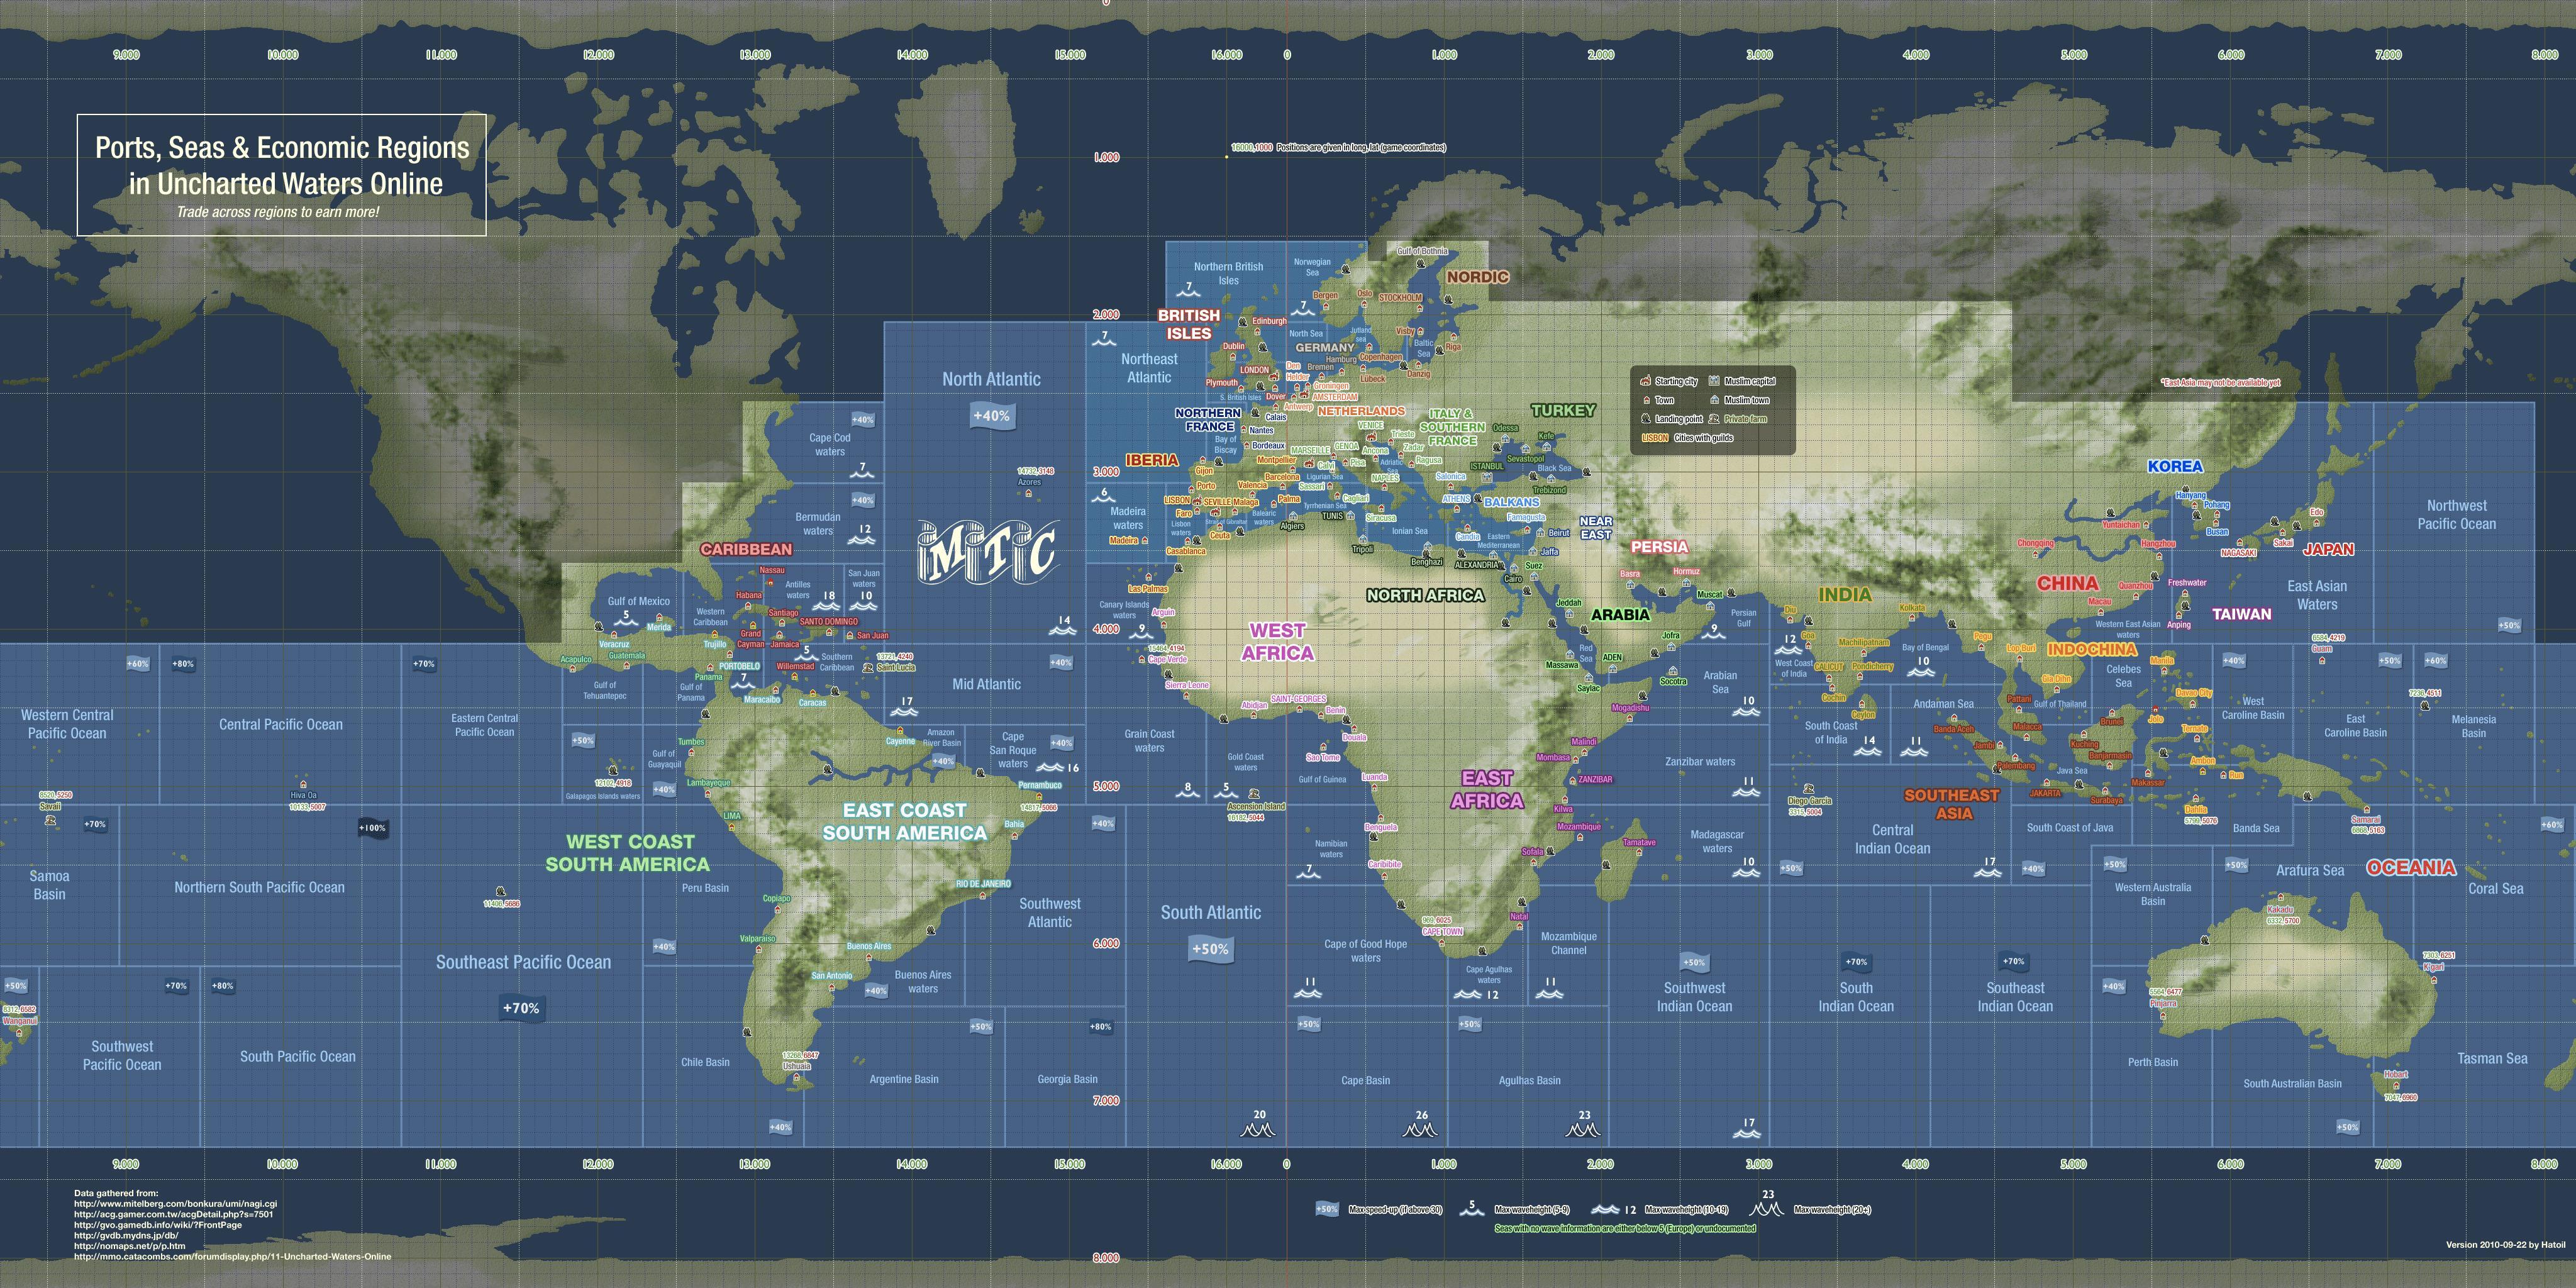 World%20Map.jpg